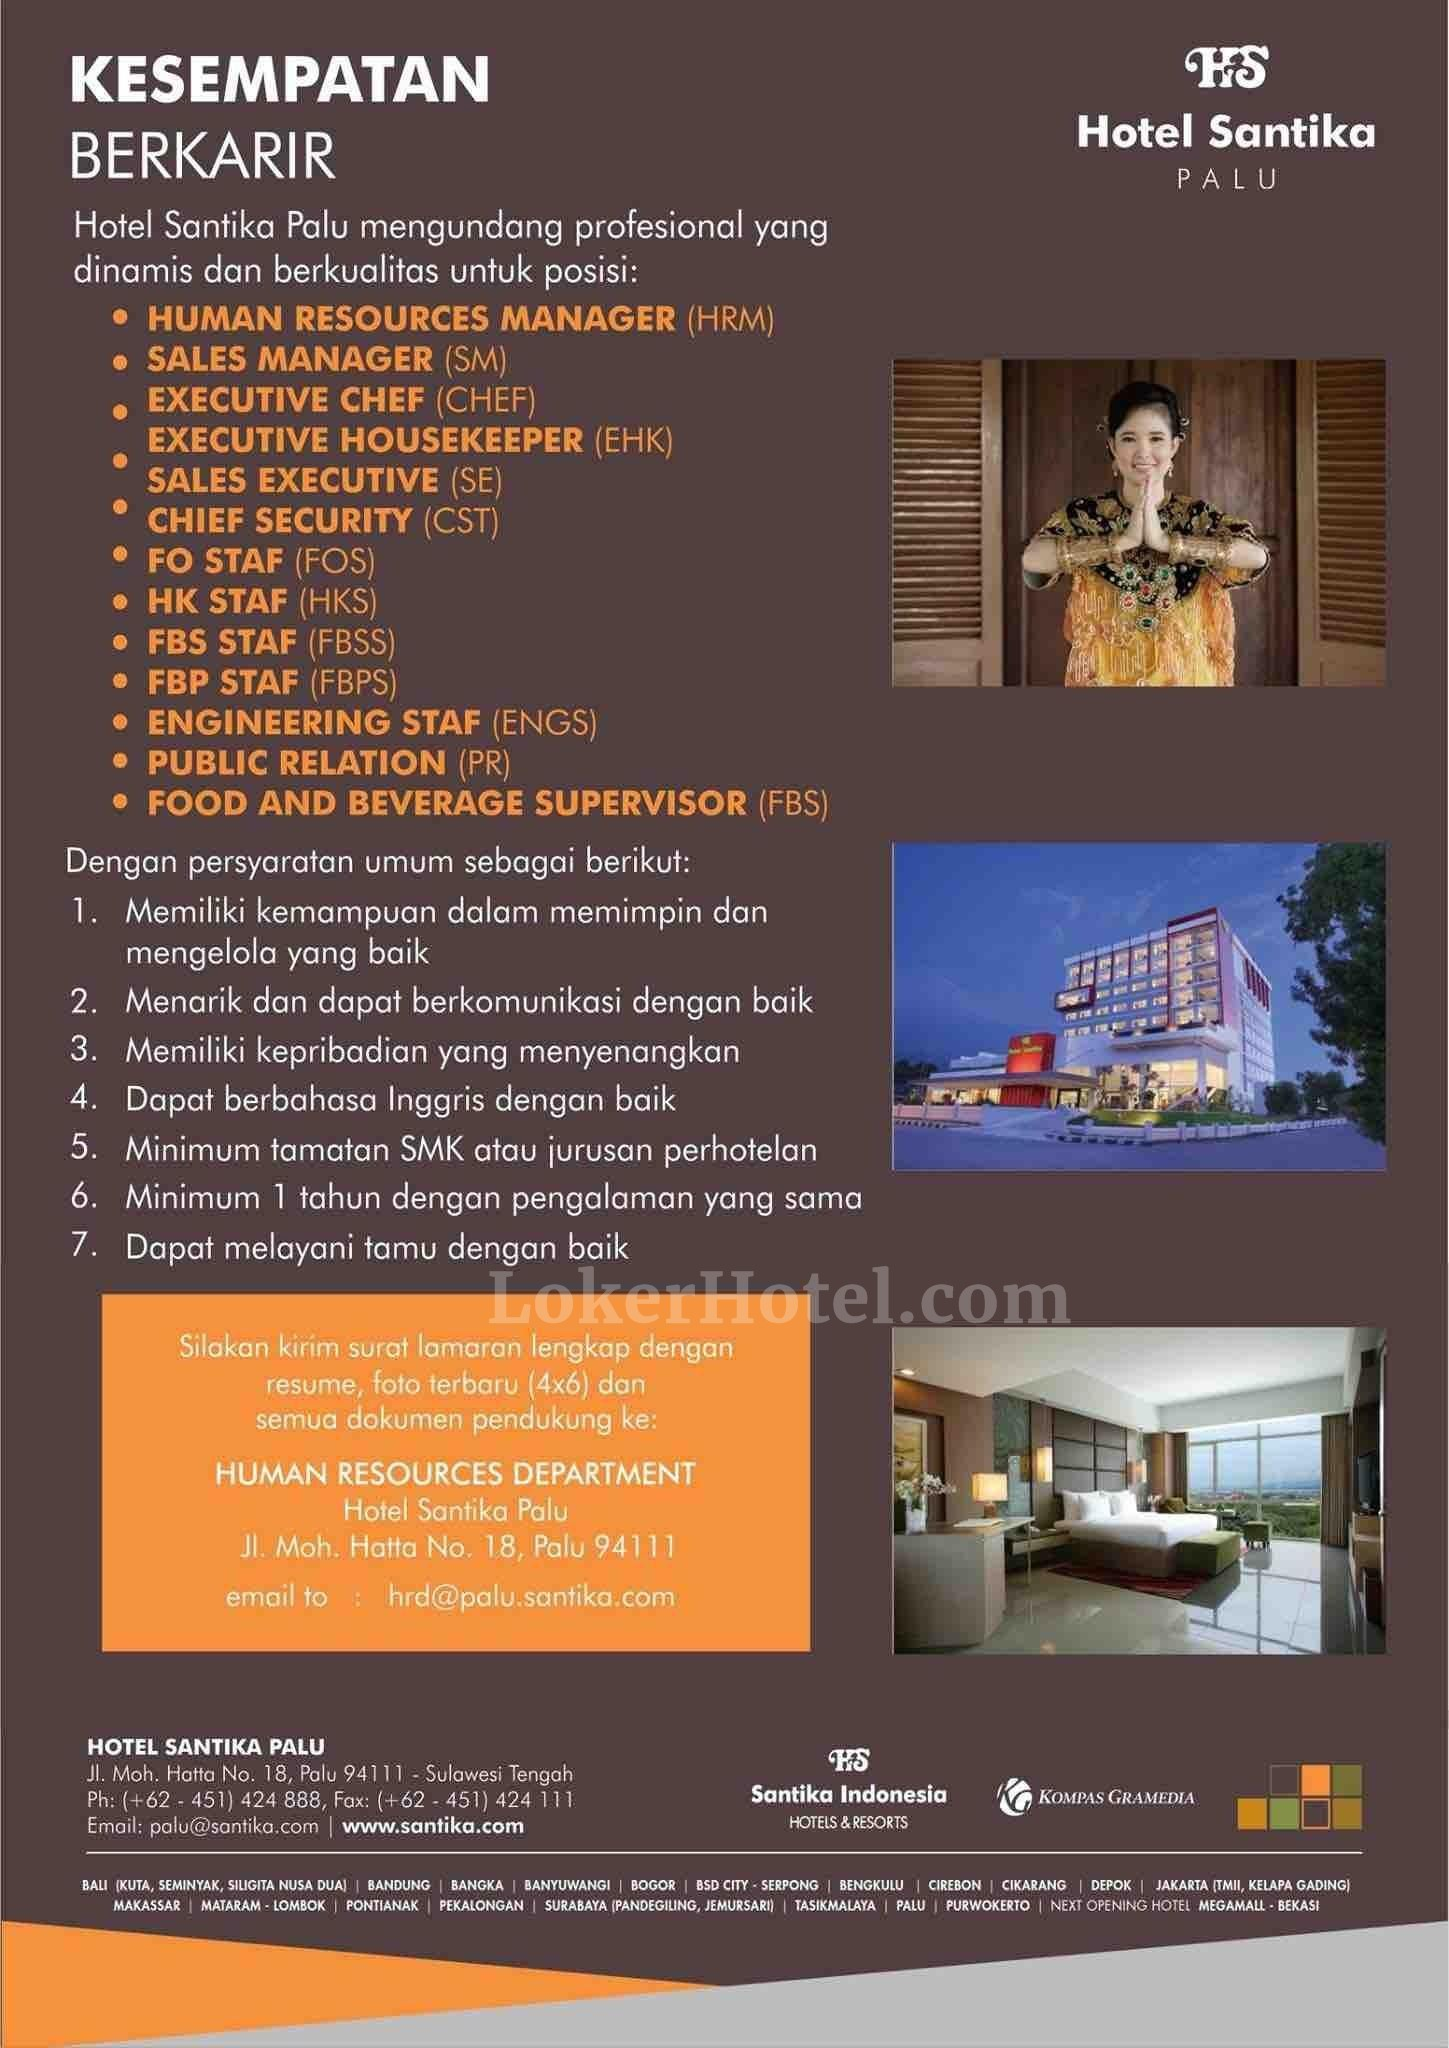 Lowongan Kerja Hotel Santika Palu Loker Lowongan Kerja Hotel